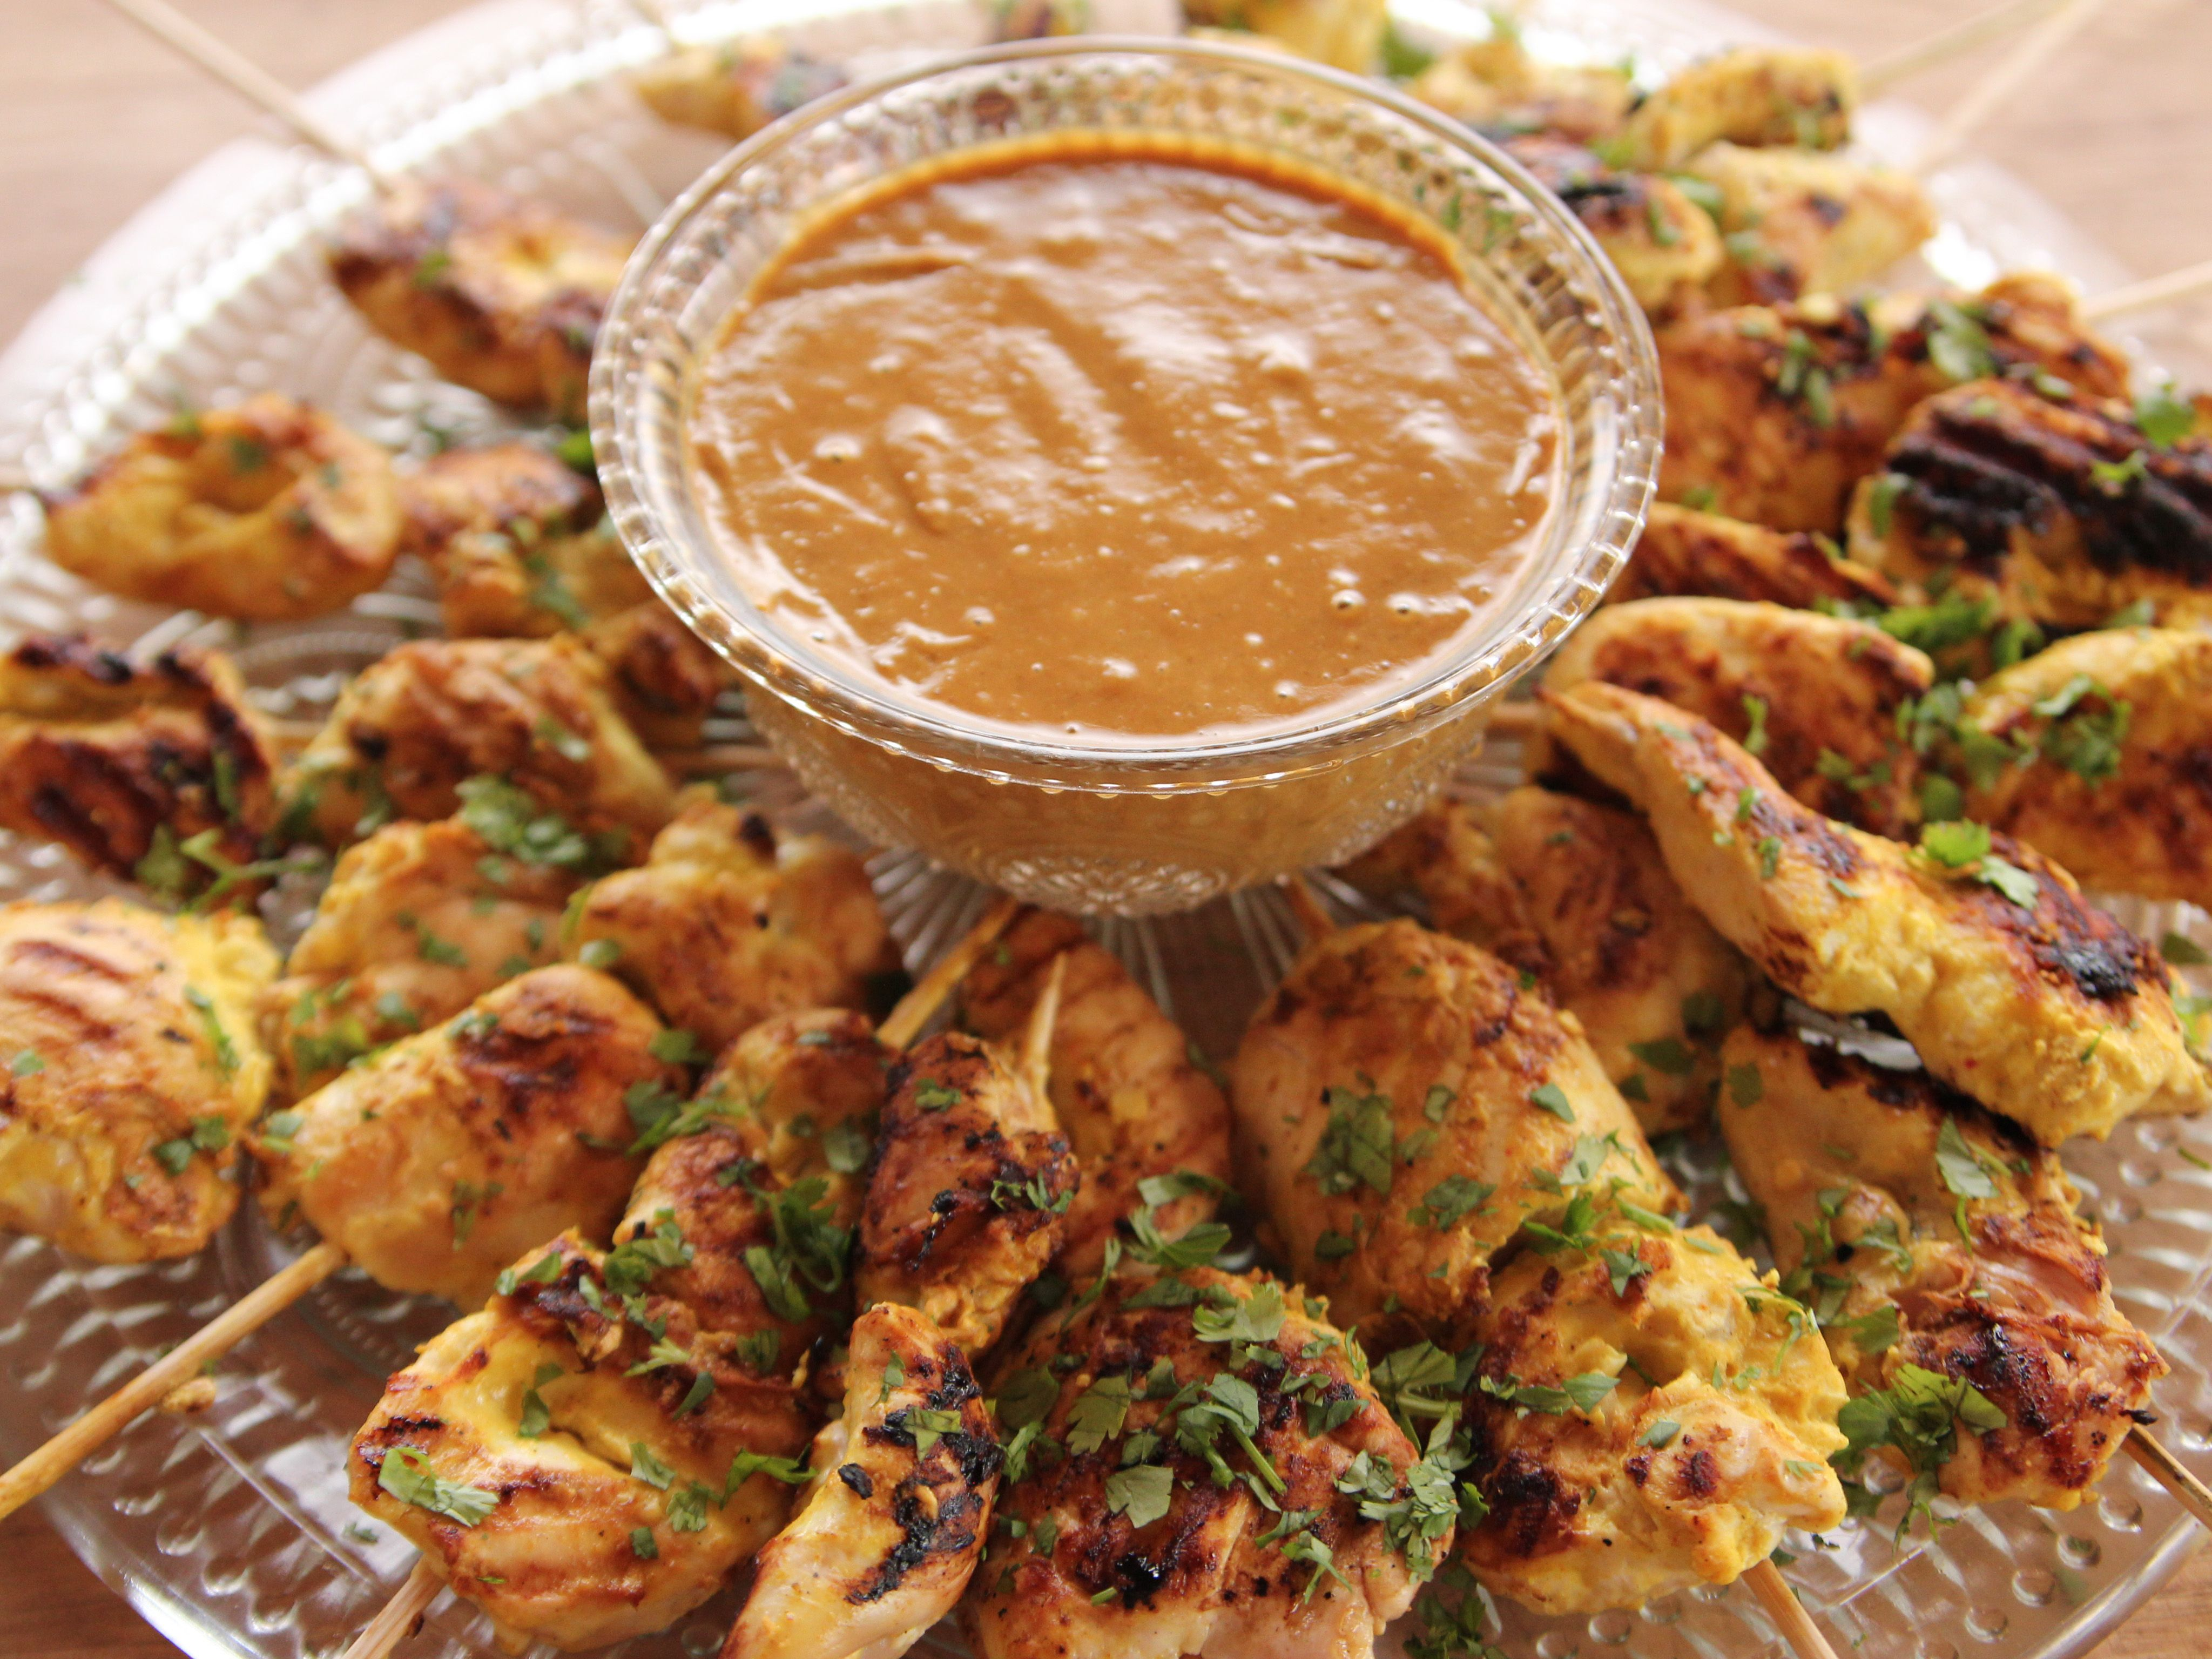 Chicken satay with peanut sauce recipe peanut sauce recipes chicken satay with peanut sauce forumfinder Gallery